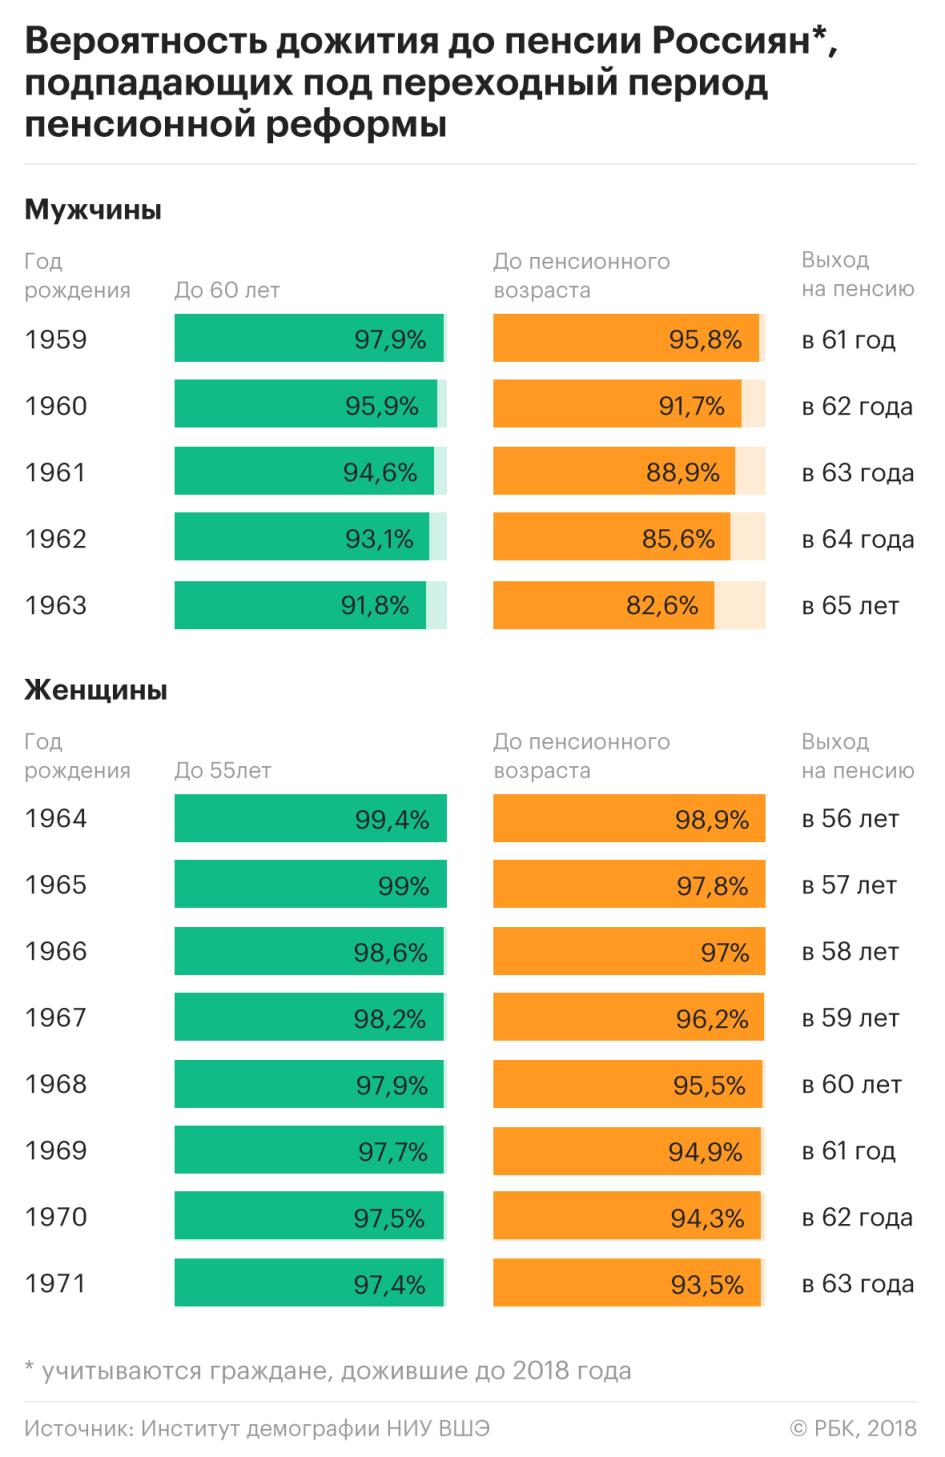 дожитие-до-пенсионного-возраста